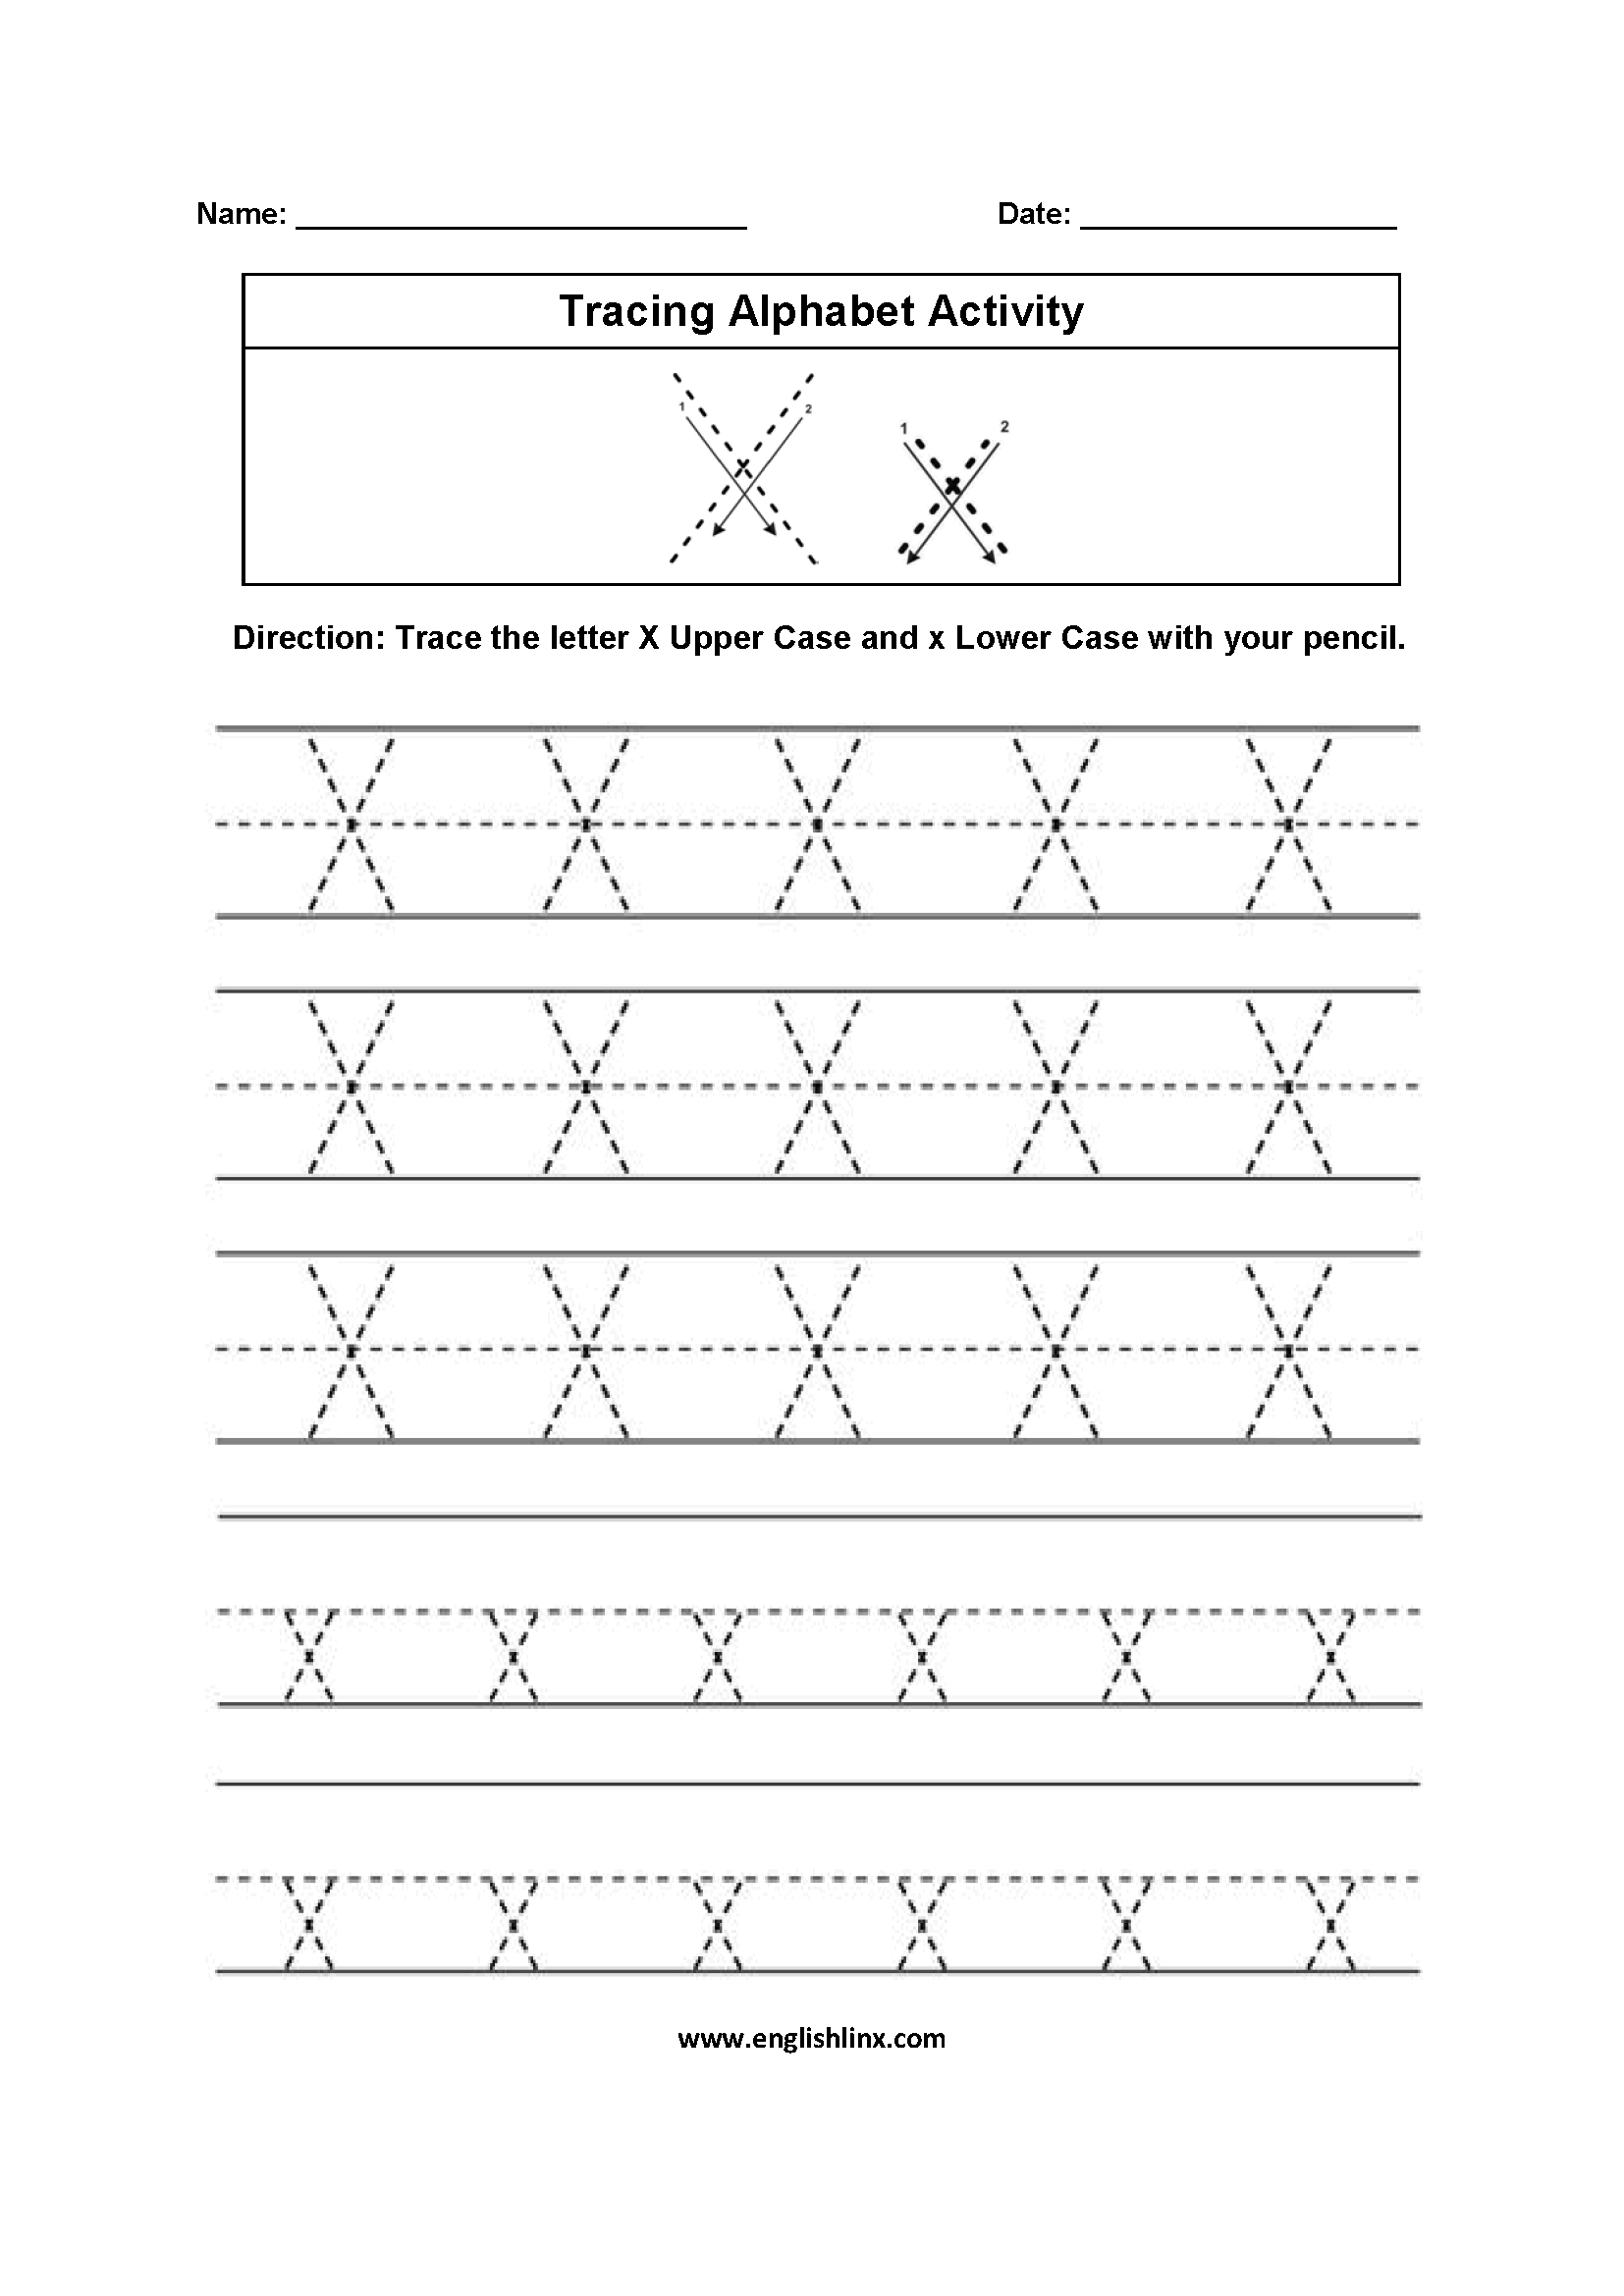 Alphabet Worksheets | Tracing Alphabet Worksheets regarding Letter X Tracing Sheet